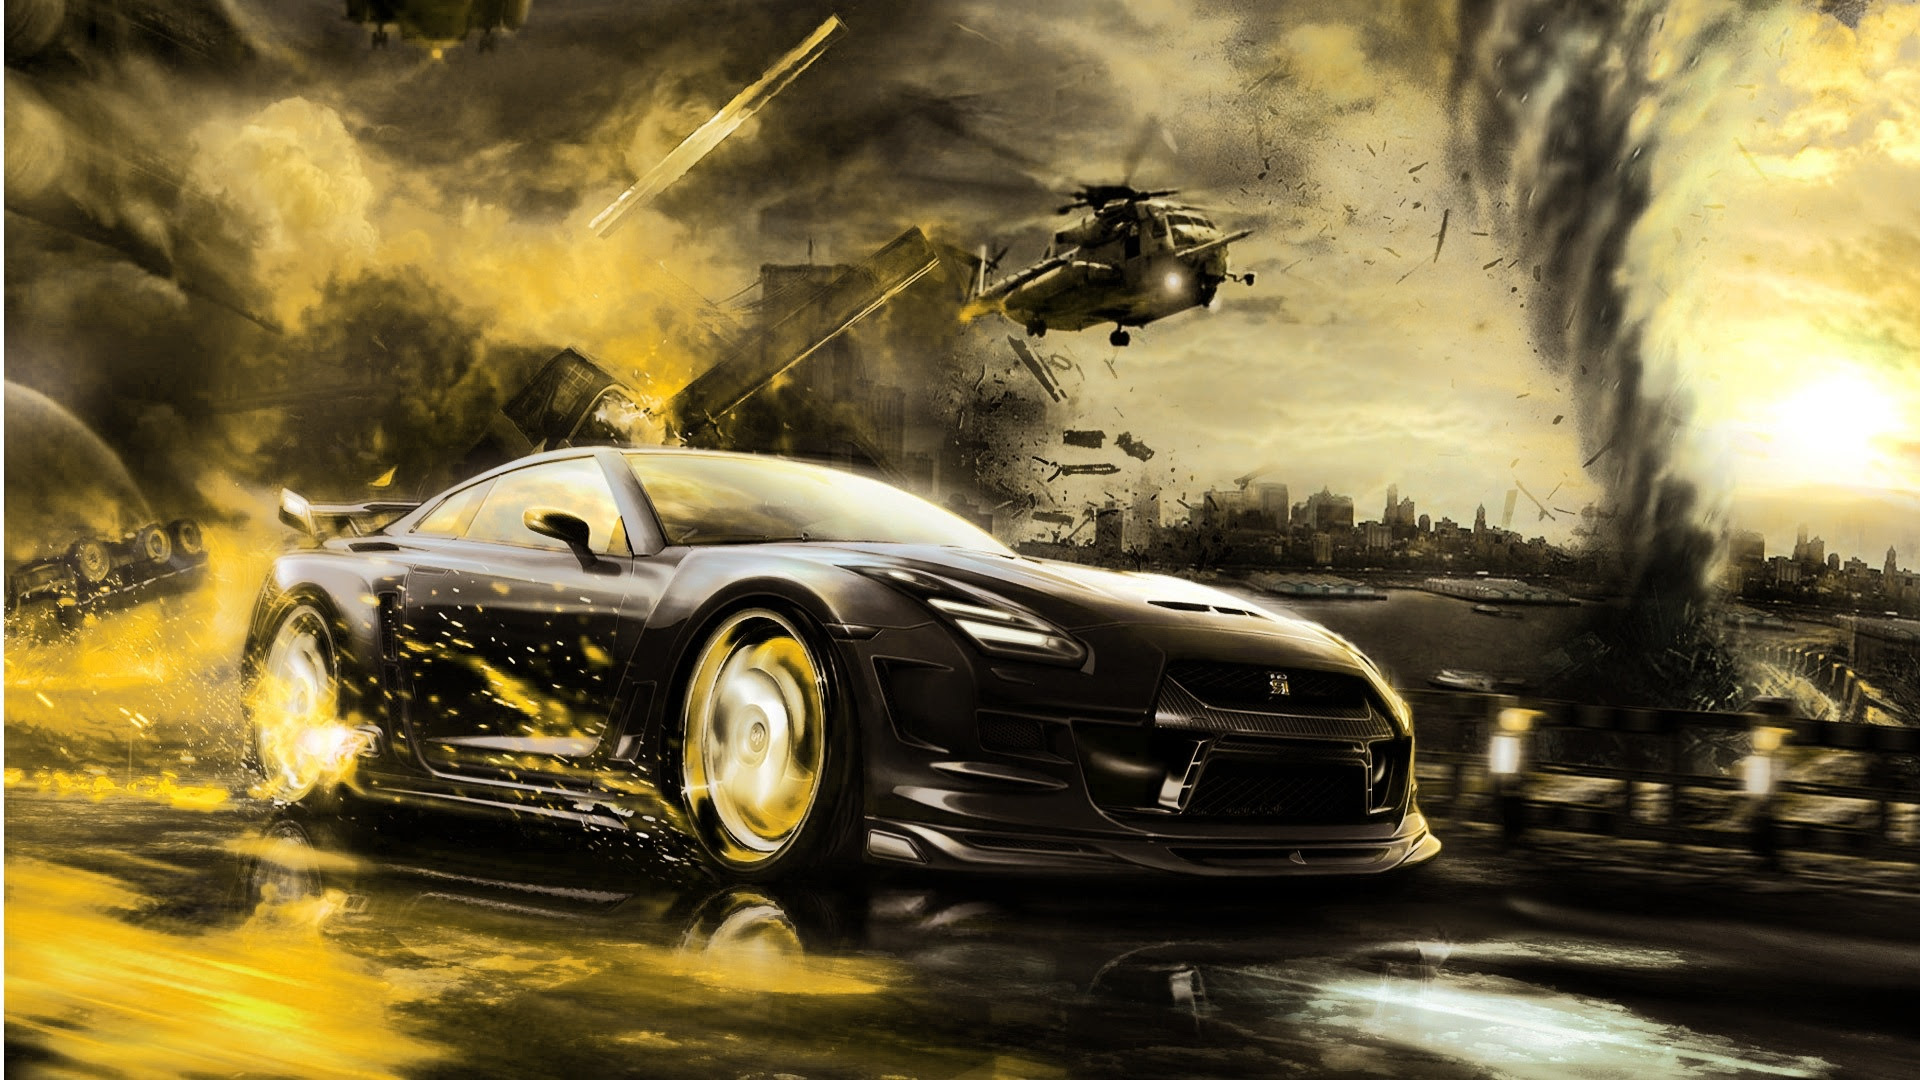 Cool Car Background Wallpapers  PixelsTalk.Net